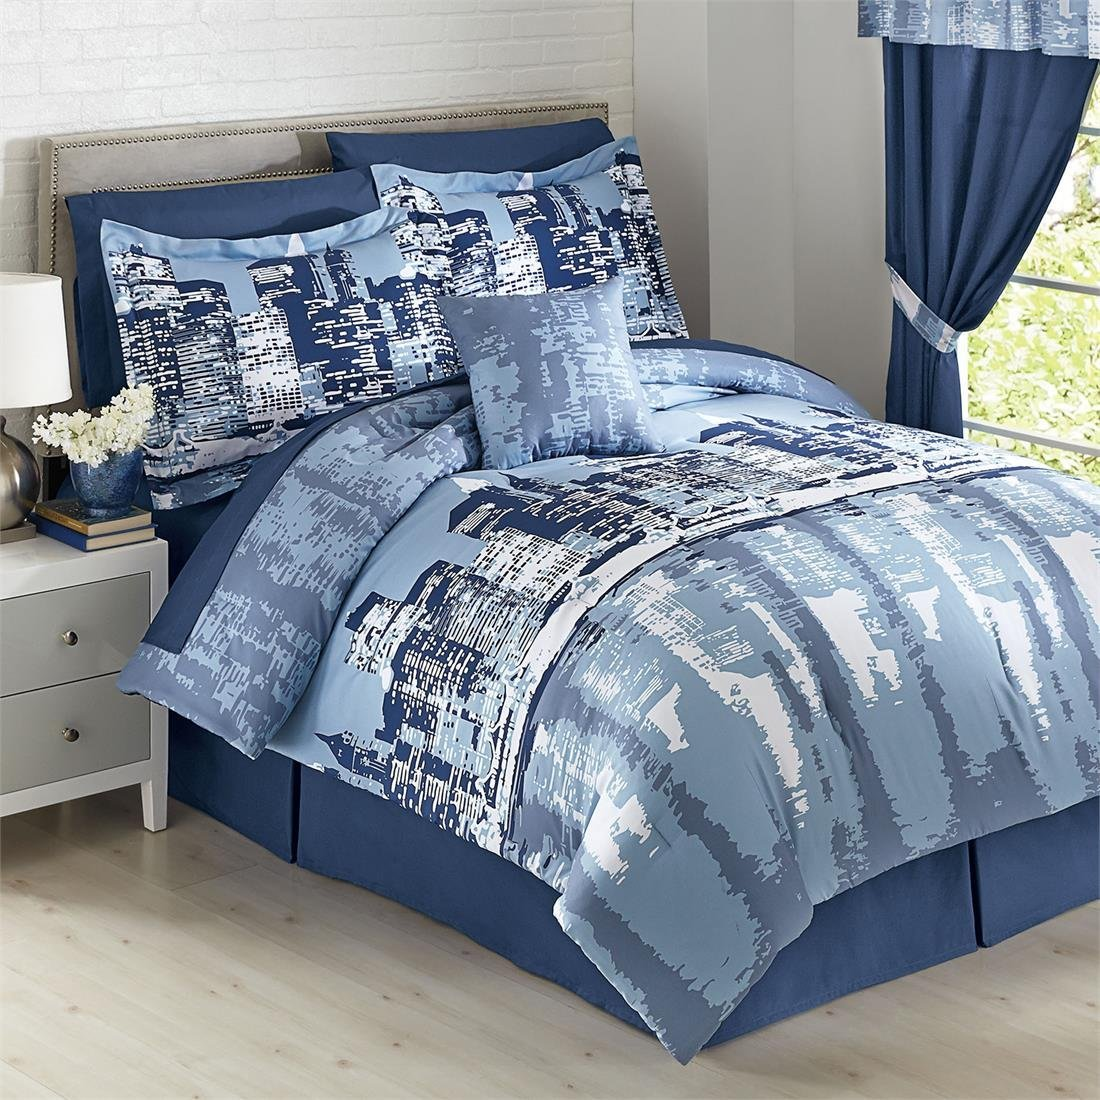 Total fab new york city themed skyline comforters sets for New york city themed bedroom decor